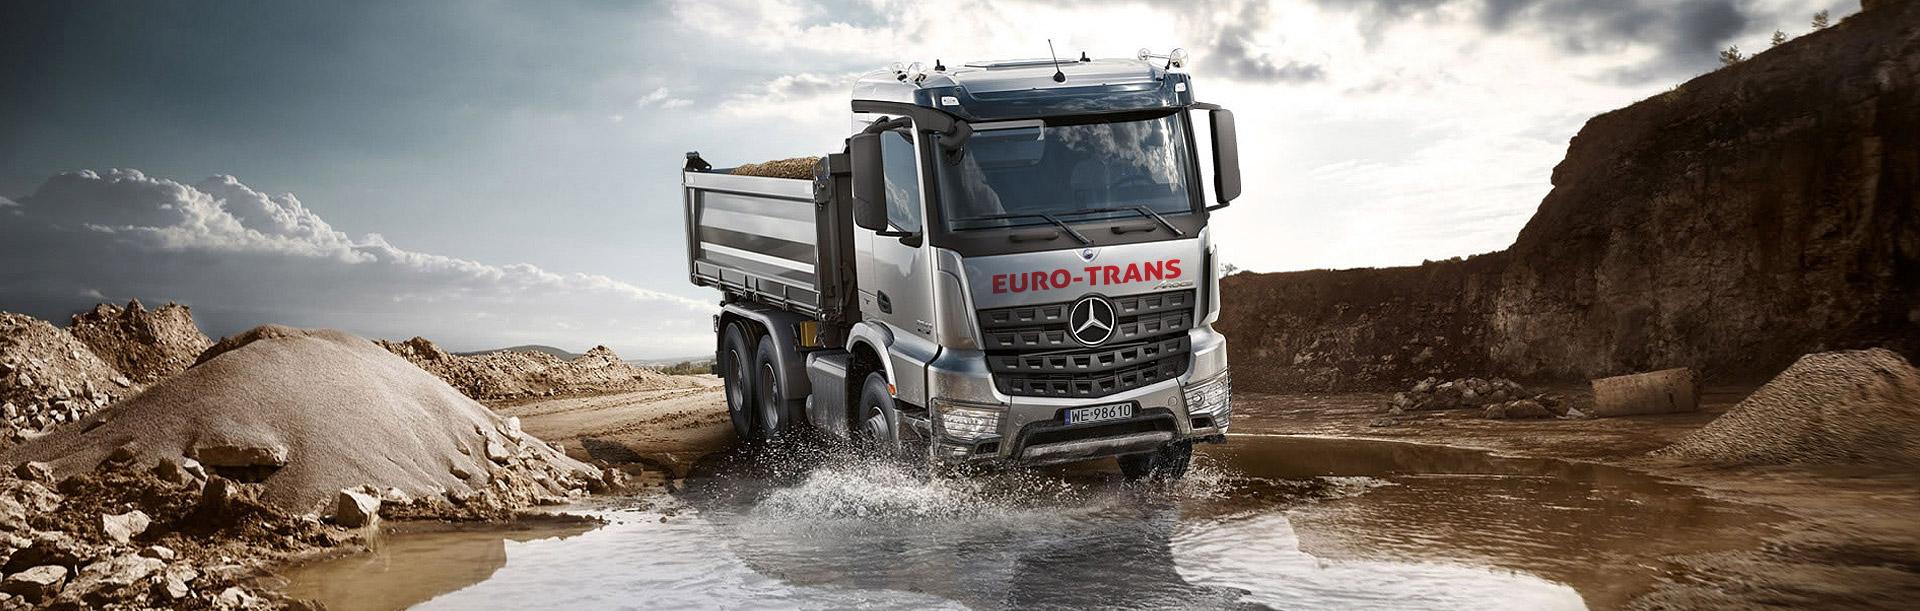 euro-trans - projekty